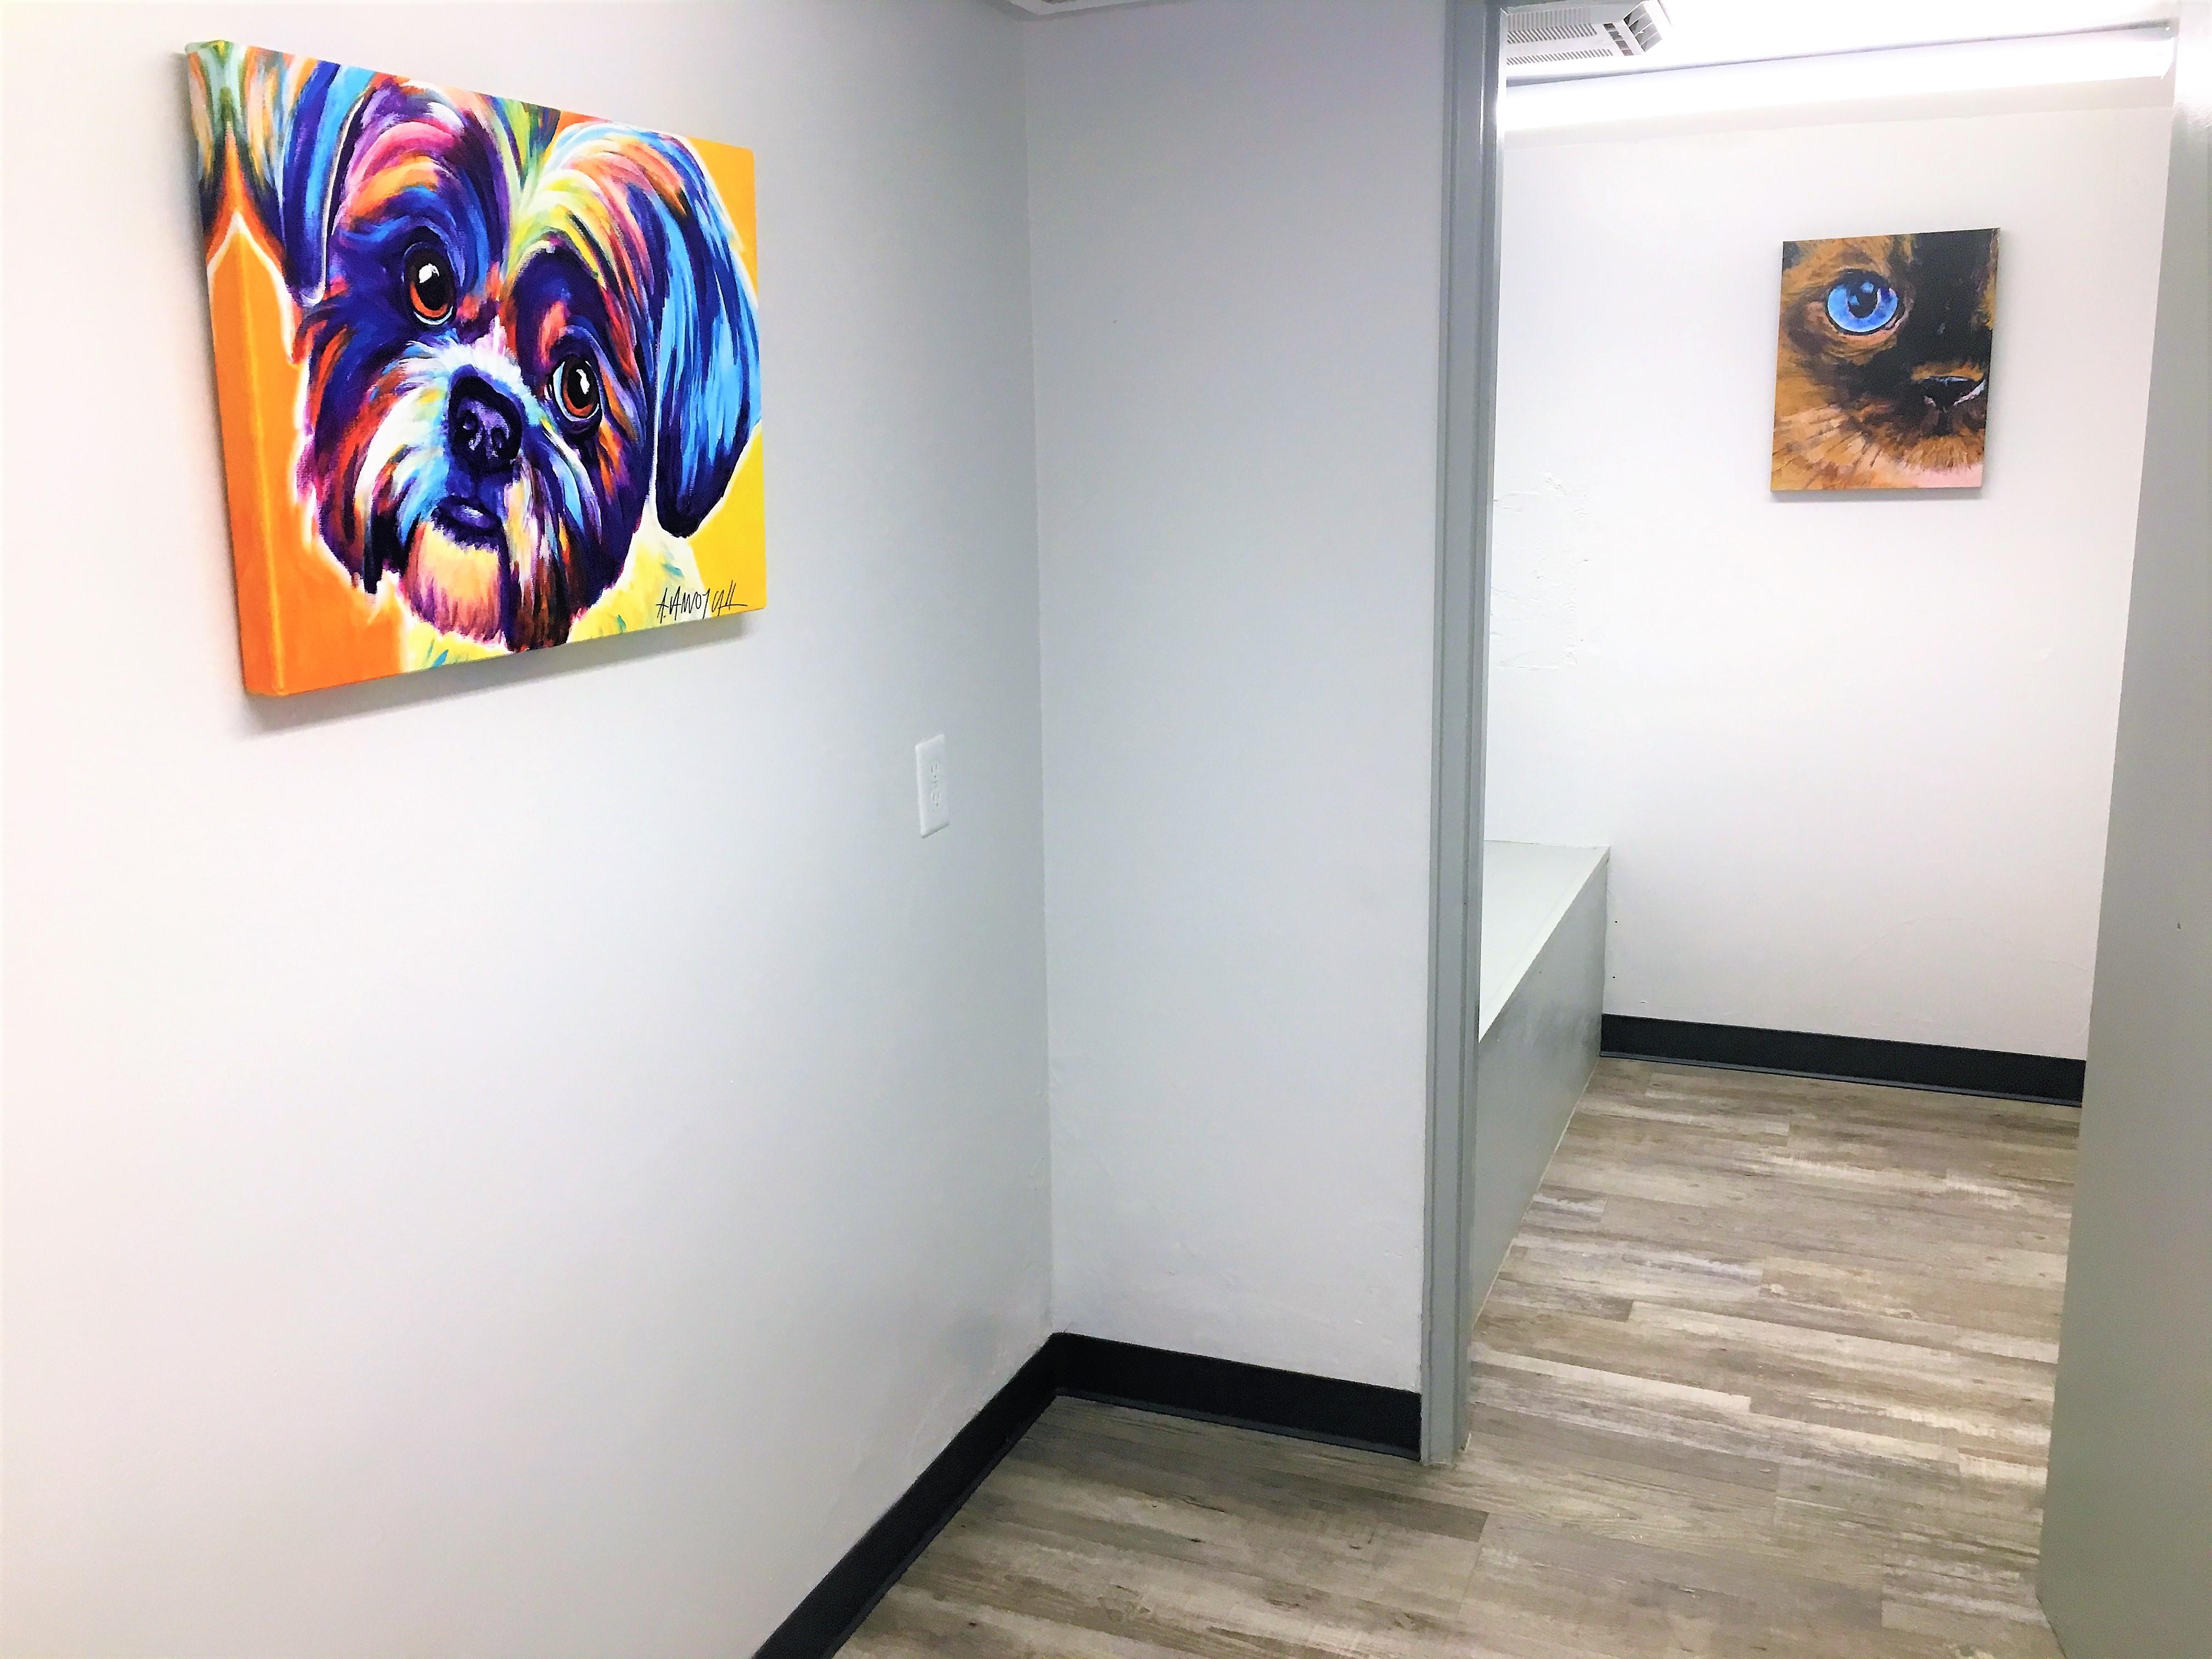 hallway art on walls of veterinary clinic